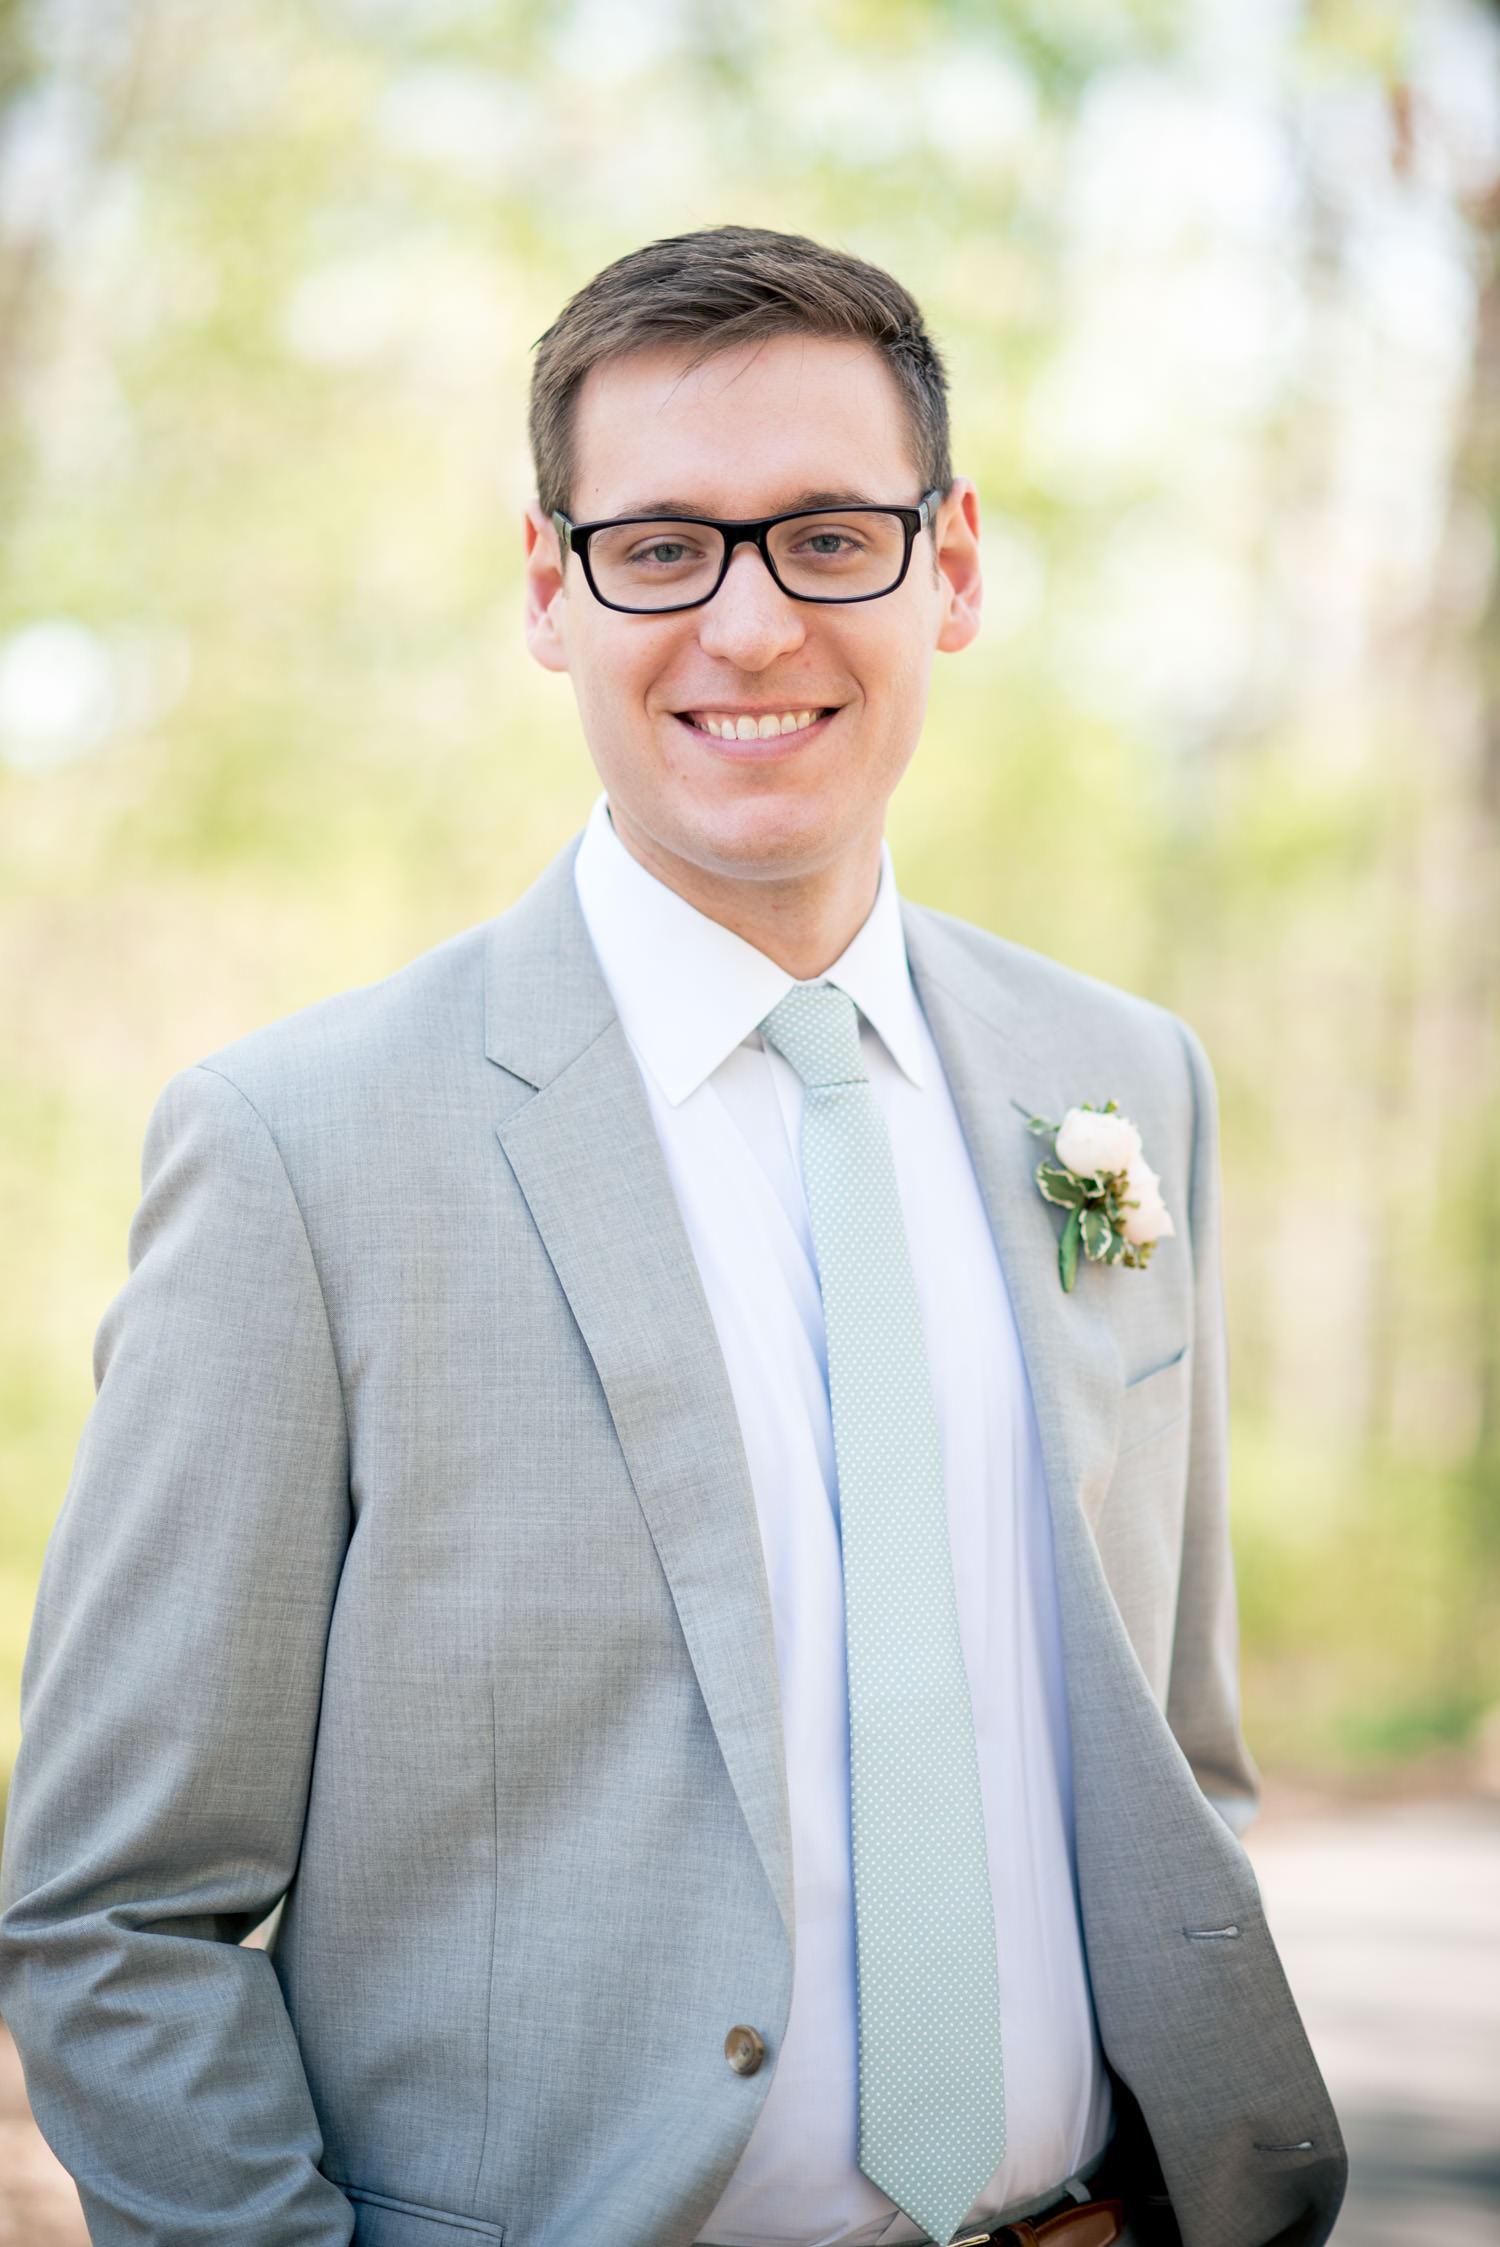 athens-wedding-groom.jpg